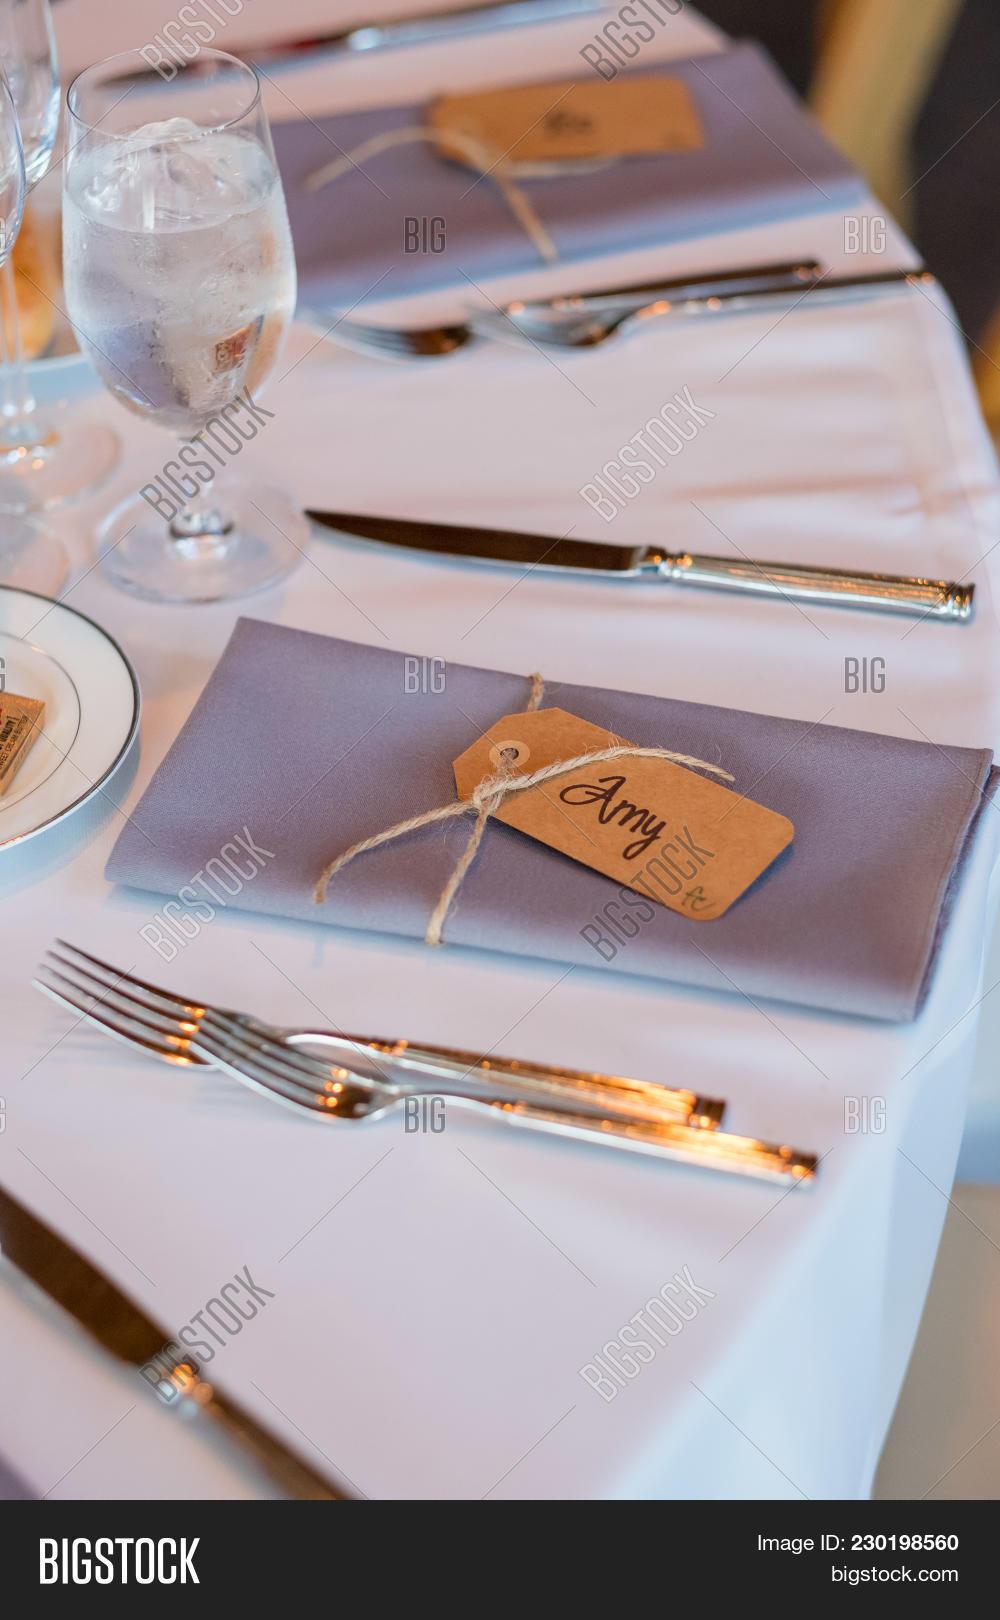 Wedding Reception Image Photo Free Trial Bigstock